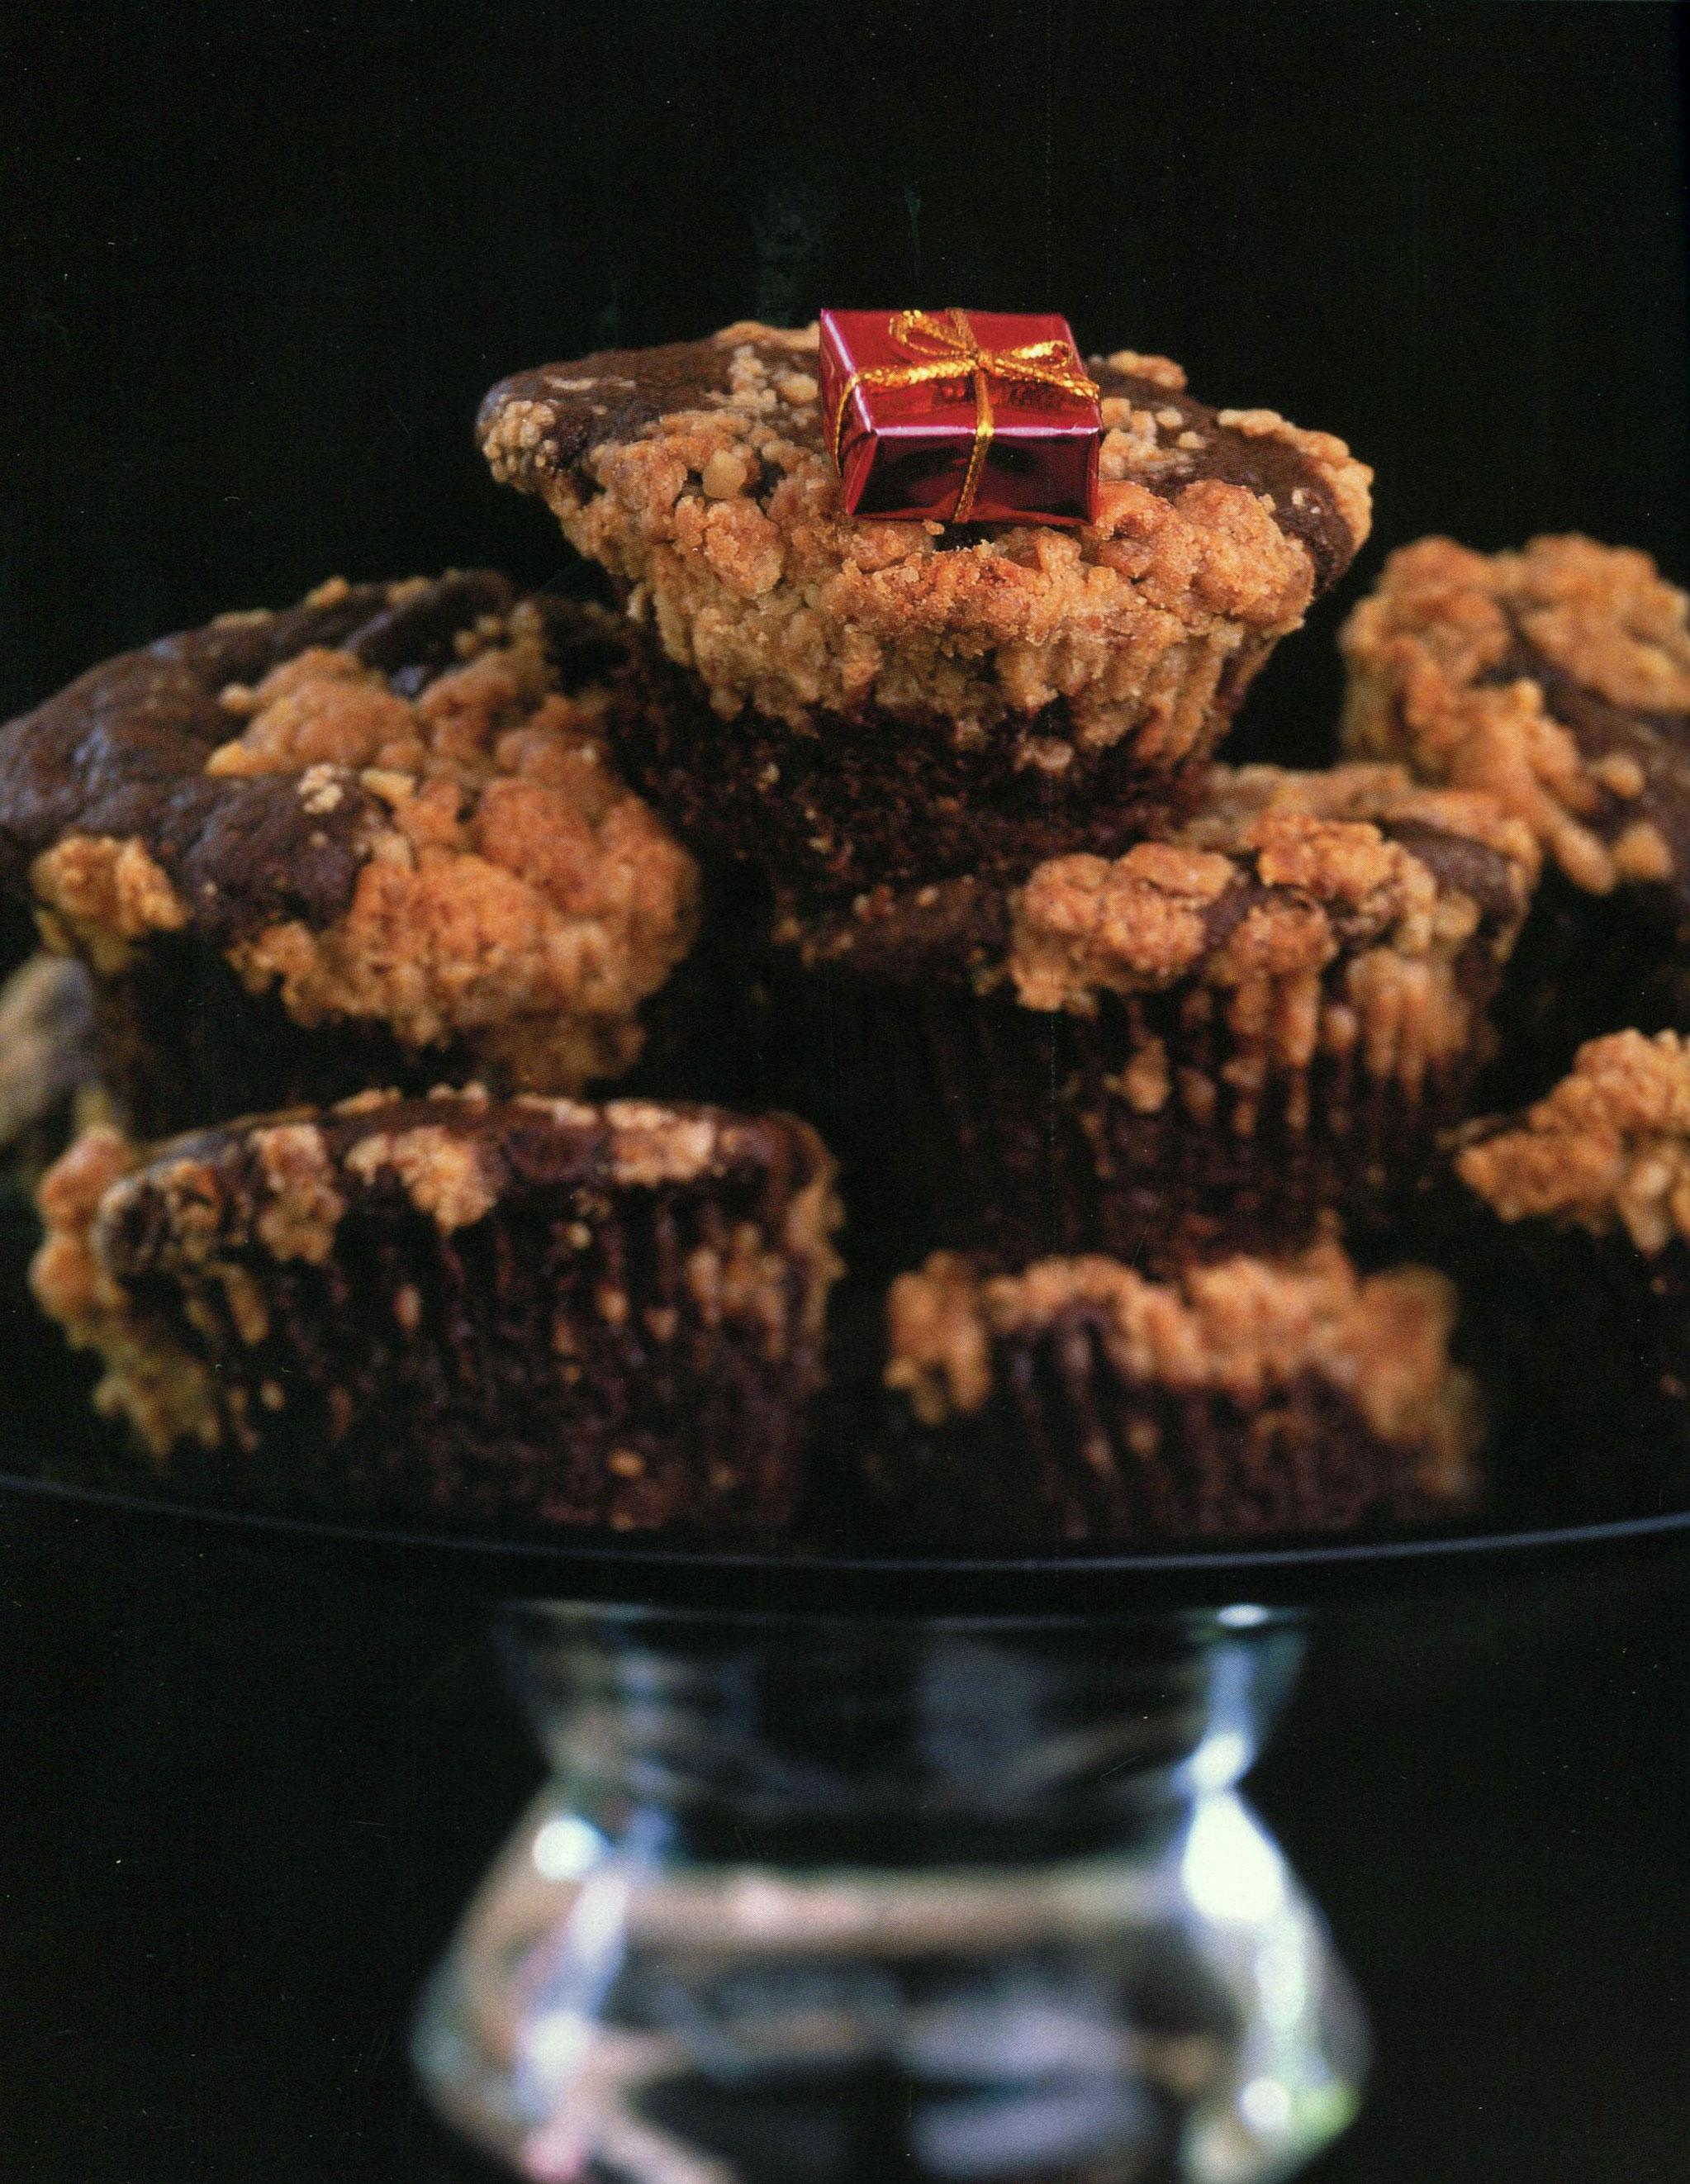 TBT Recipe: Christmas Breakfast Chocolate Sour cream Crumb Cakes